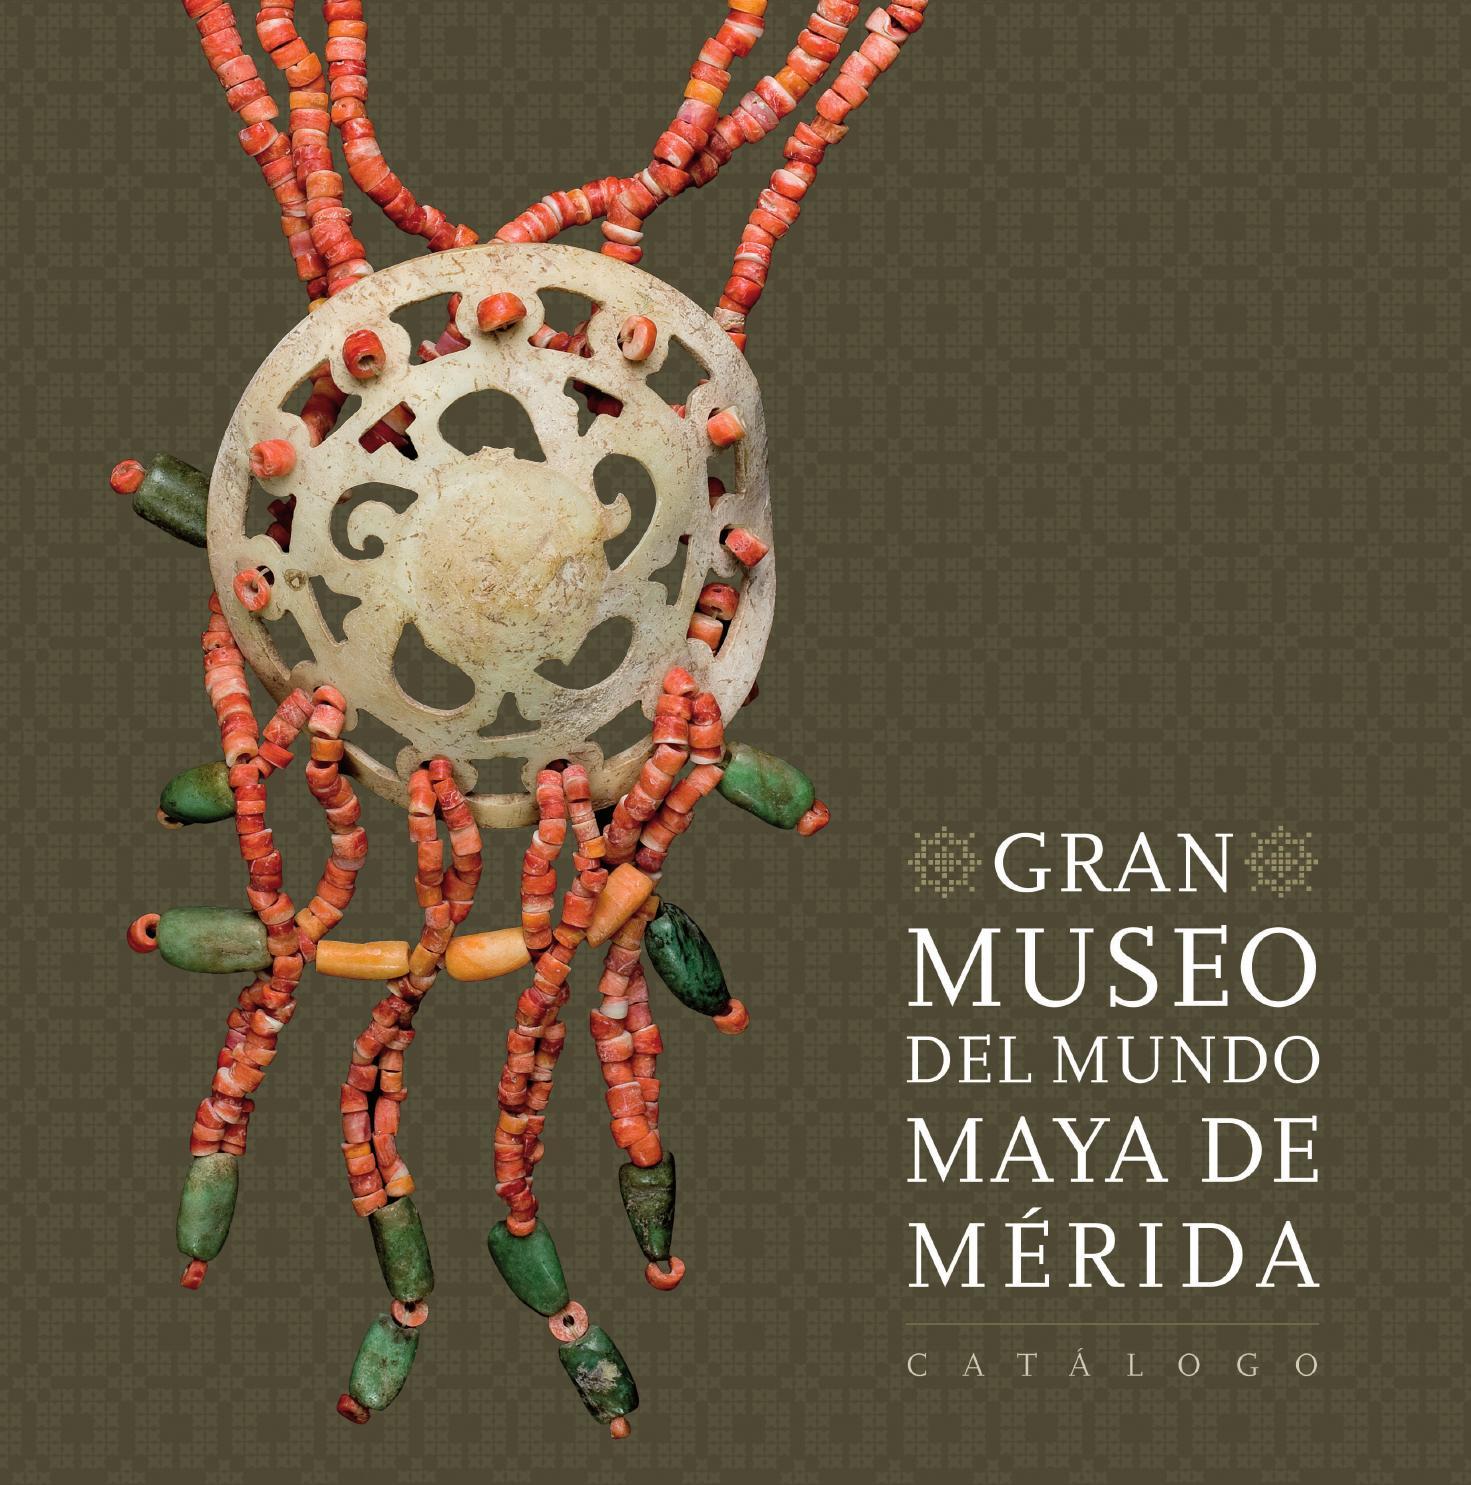 4258e28a734f Catálogo Gran Museo del Mundo Maya de Mérida by Adrian Chan - issuu